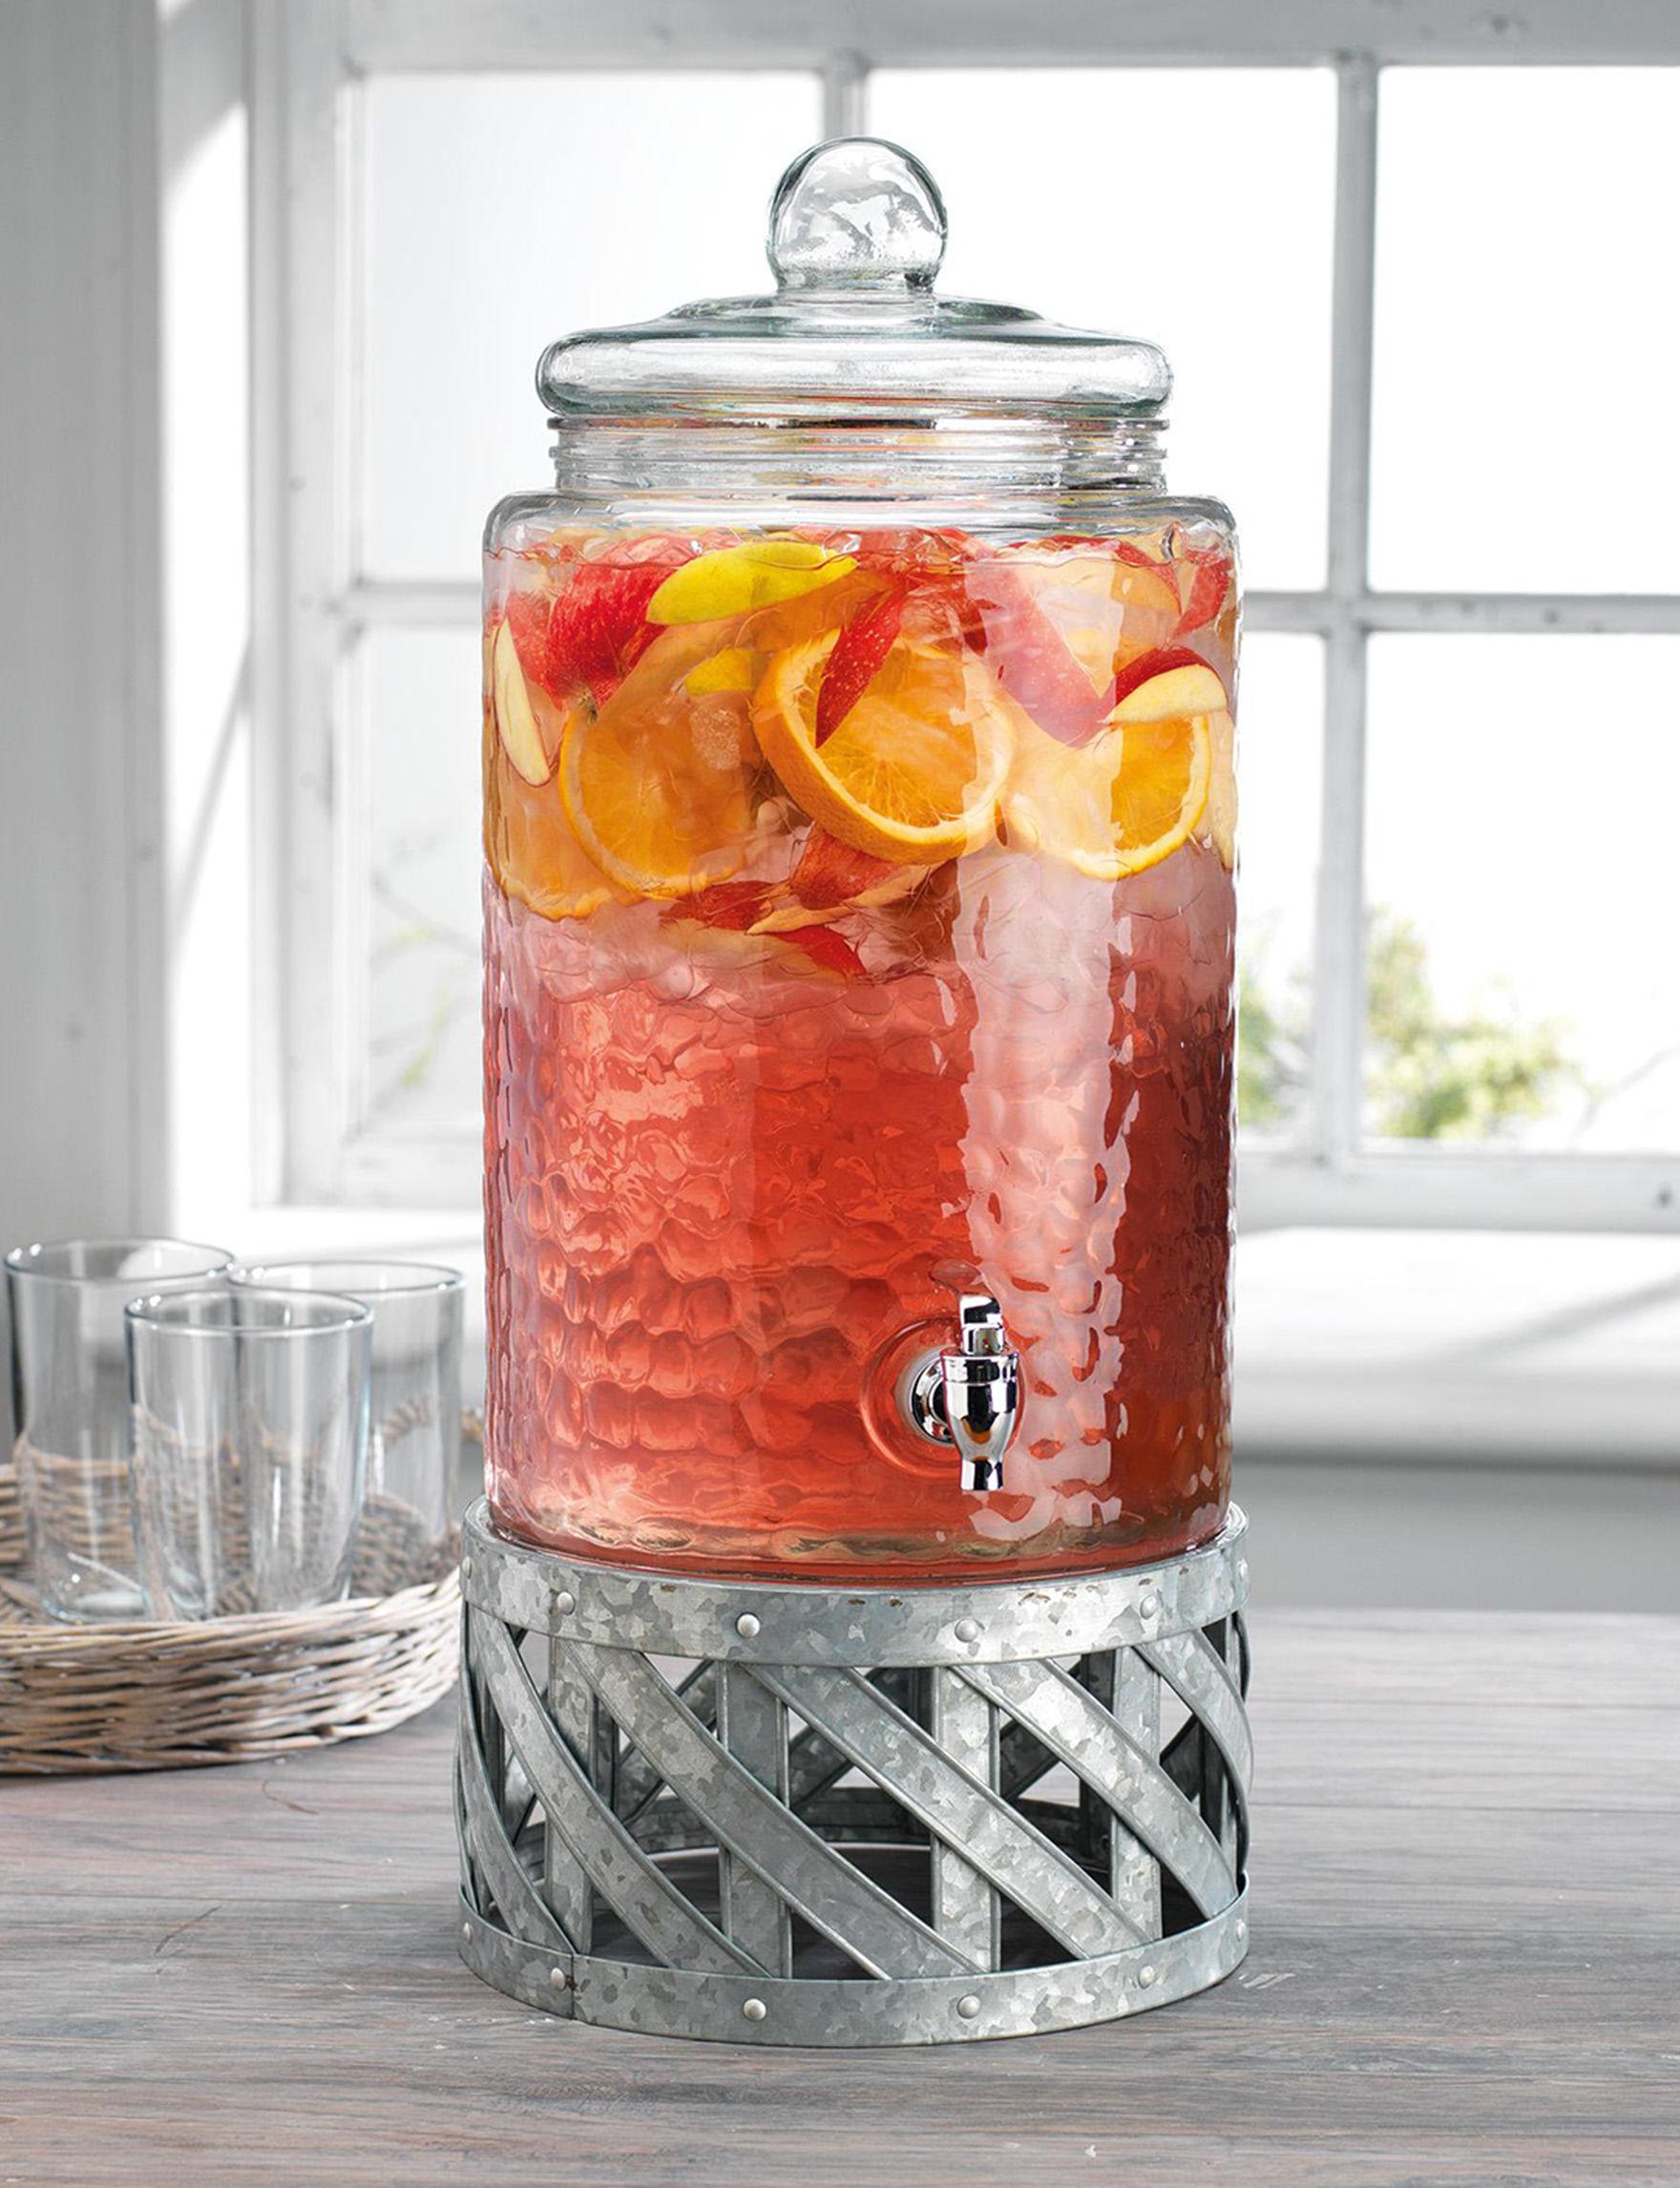 Home Essentials Silver / Glass Beverage Dispensers & Tubs Serveware